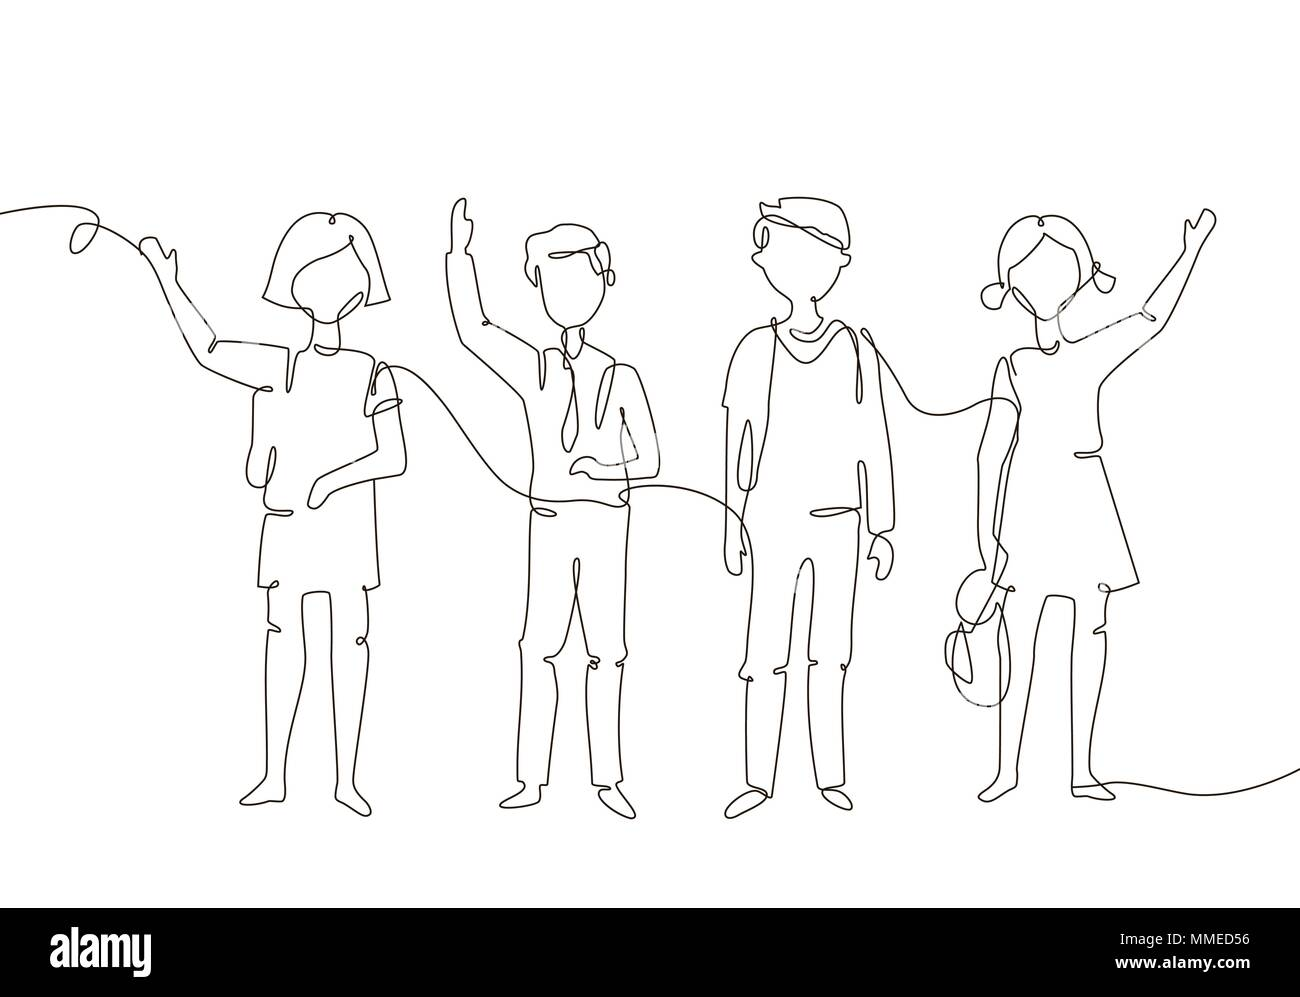 Schoolchildren - one line design style illustration - Stock Vector